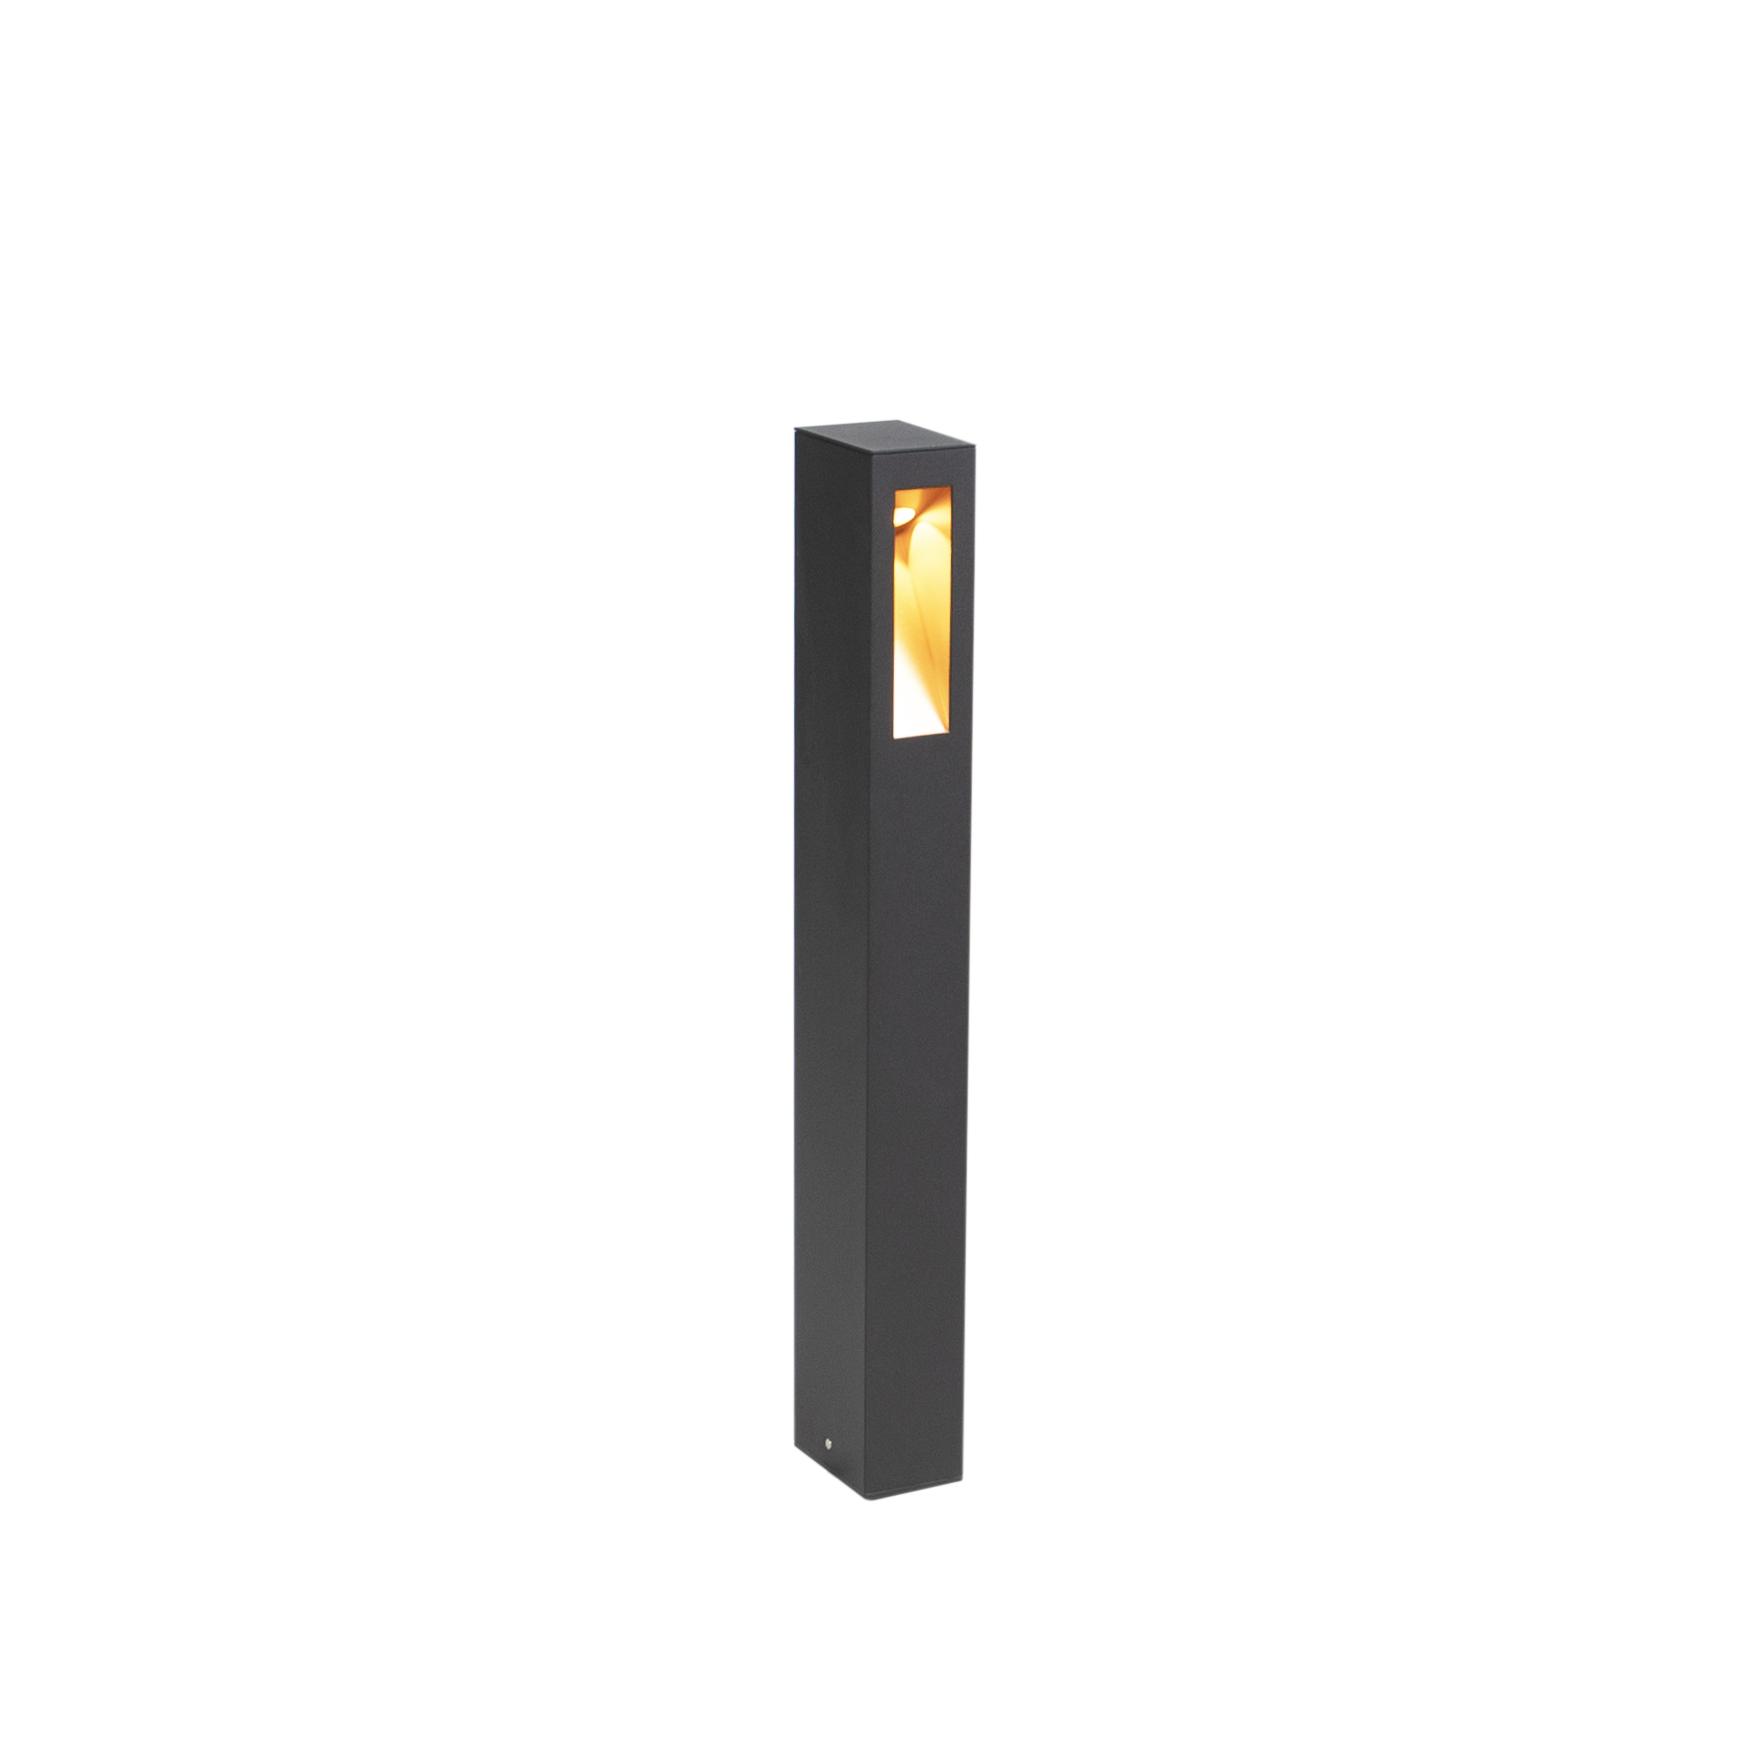 Moderne staande buitenlamp zwart 65cm incl. LED - Intorus